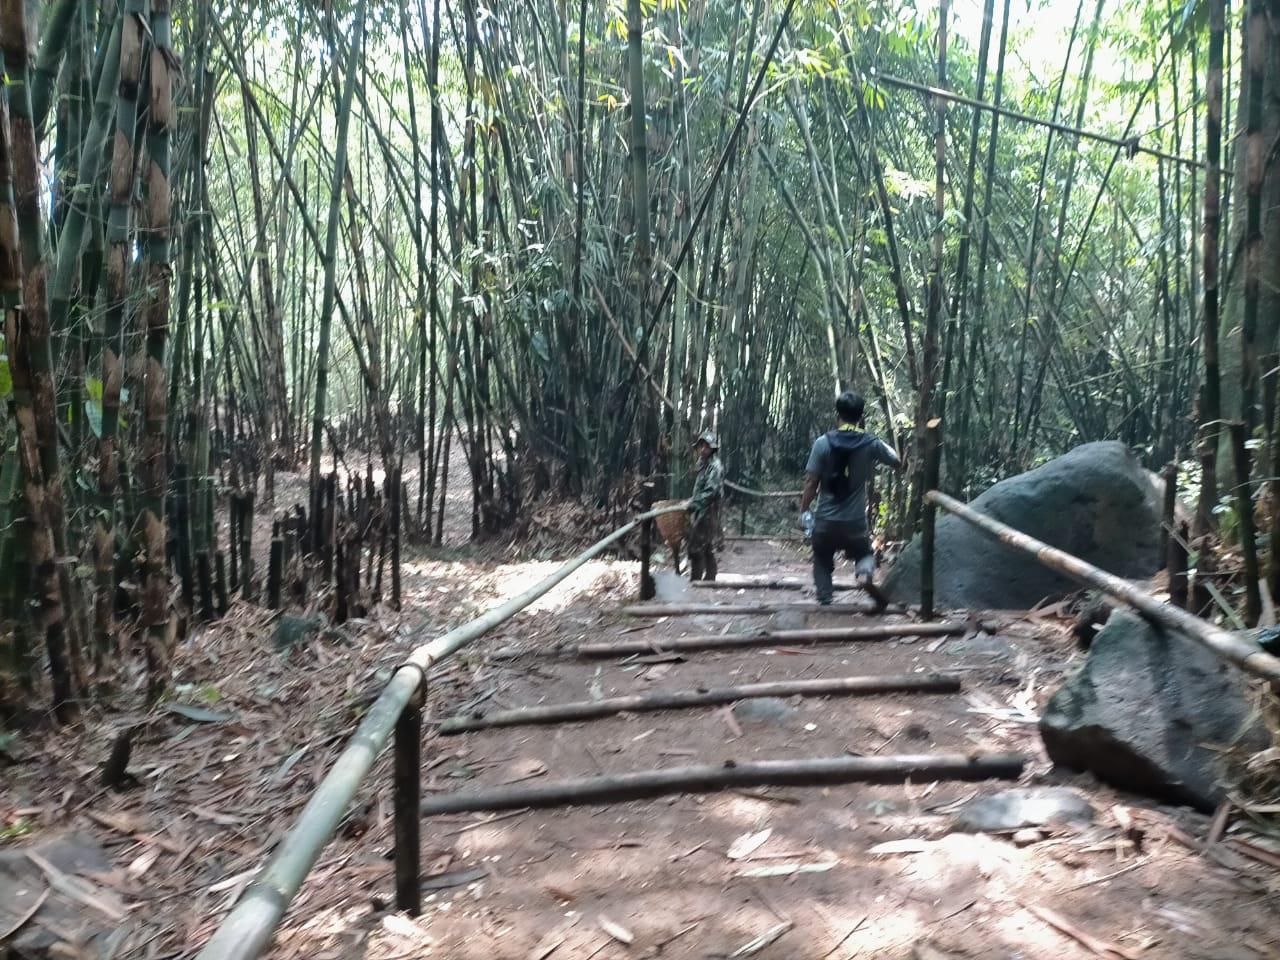 Hutan Bambu Disulap Jadi Obyek Wisata Tracking dan Selfi 235